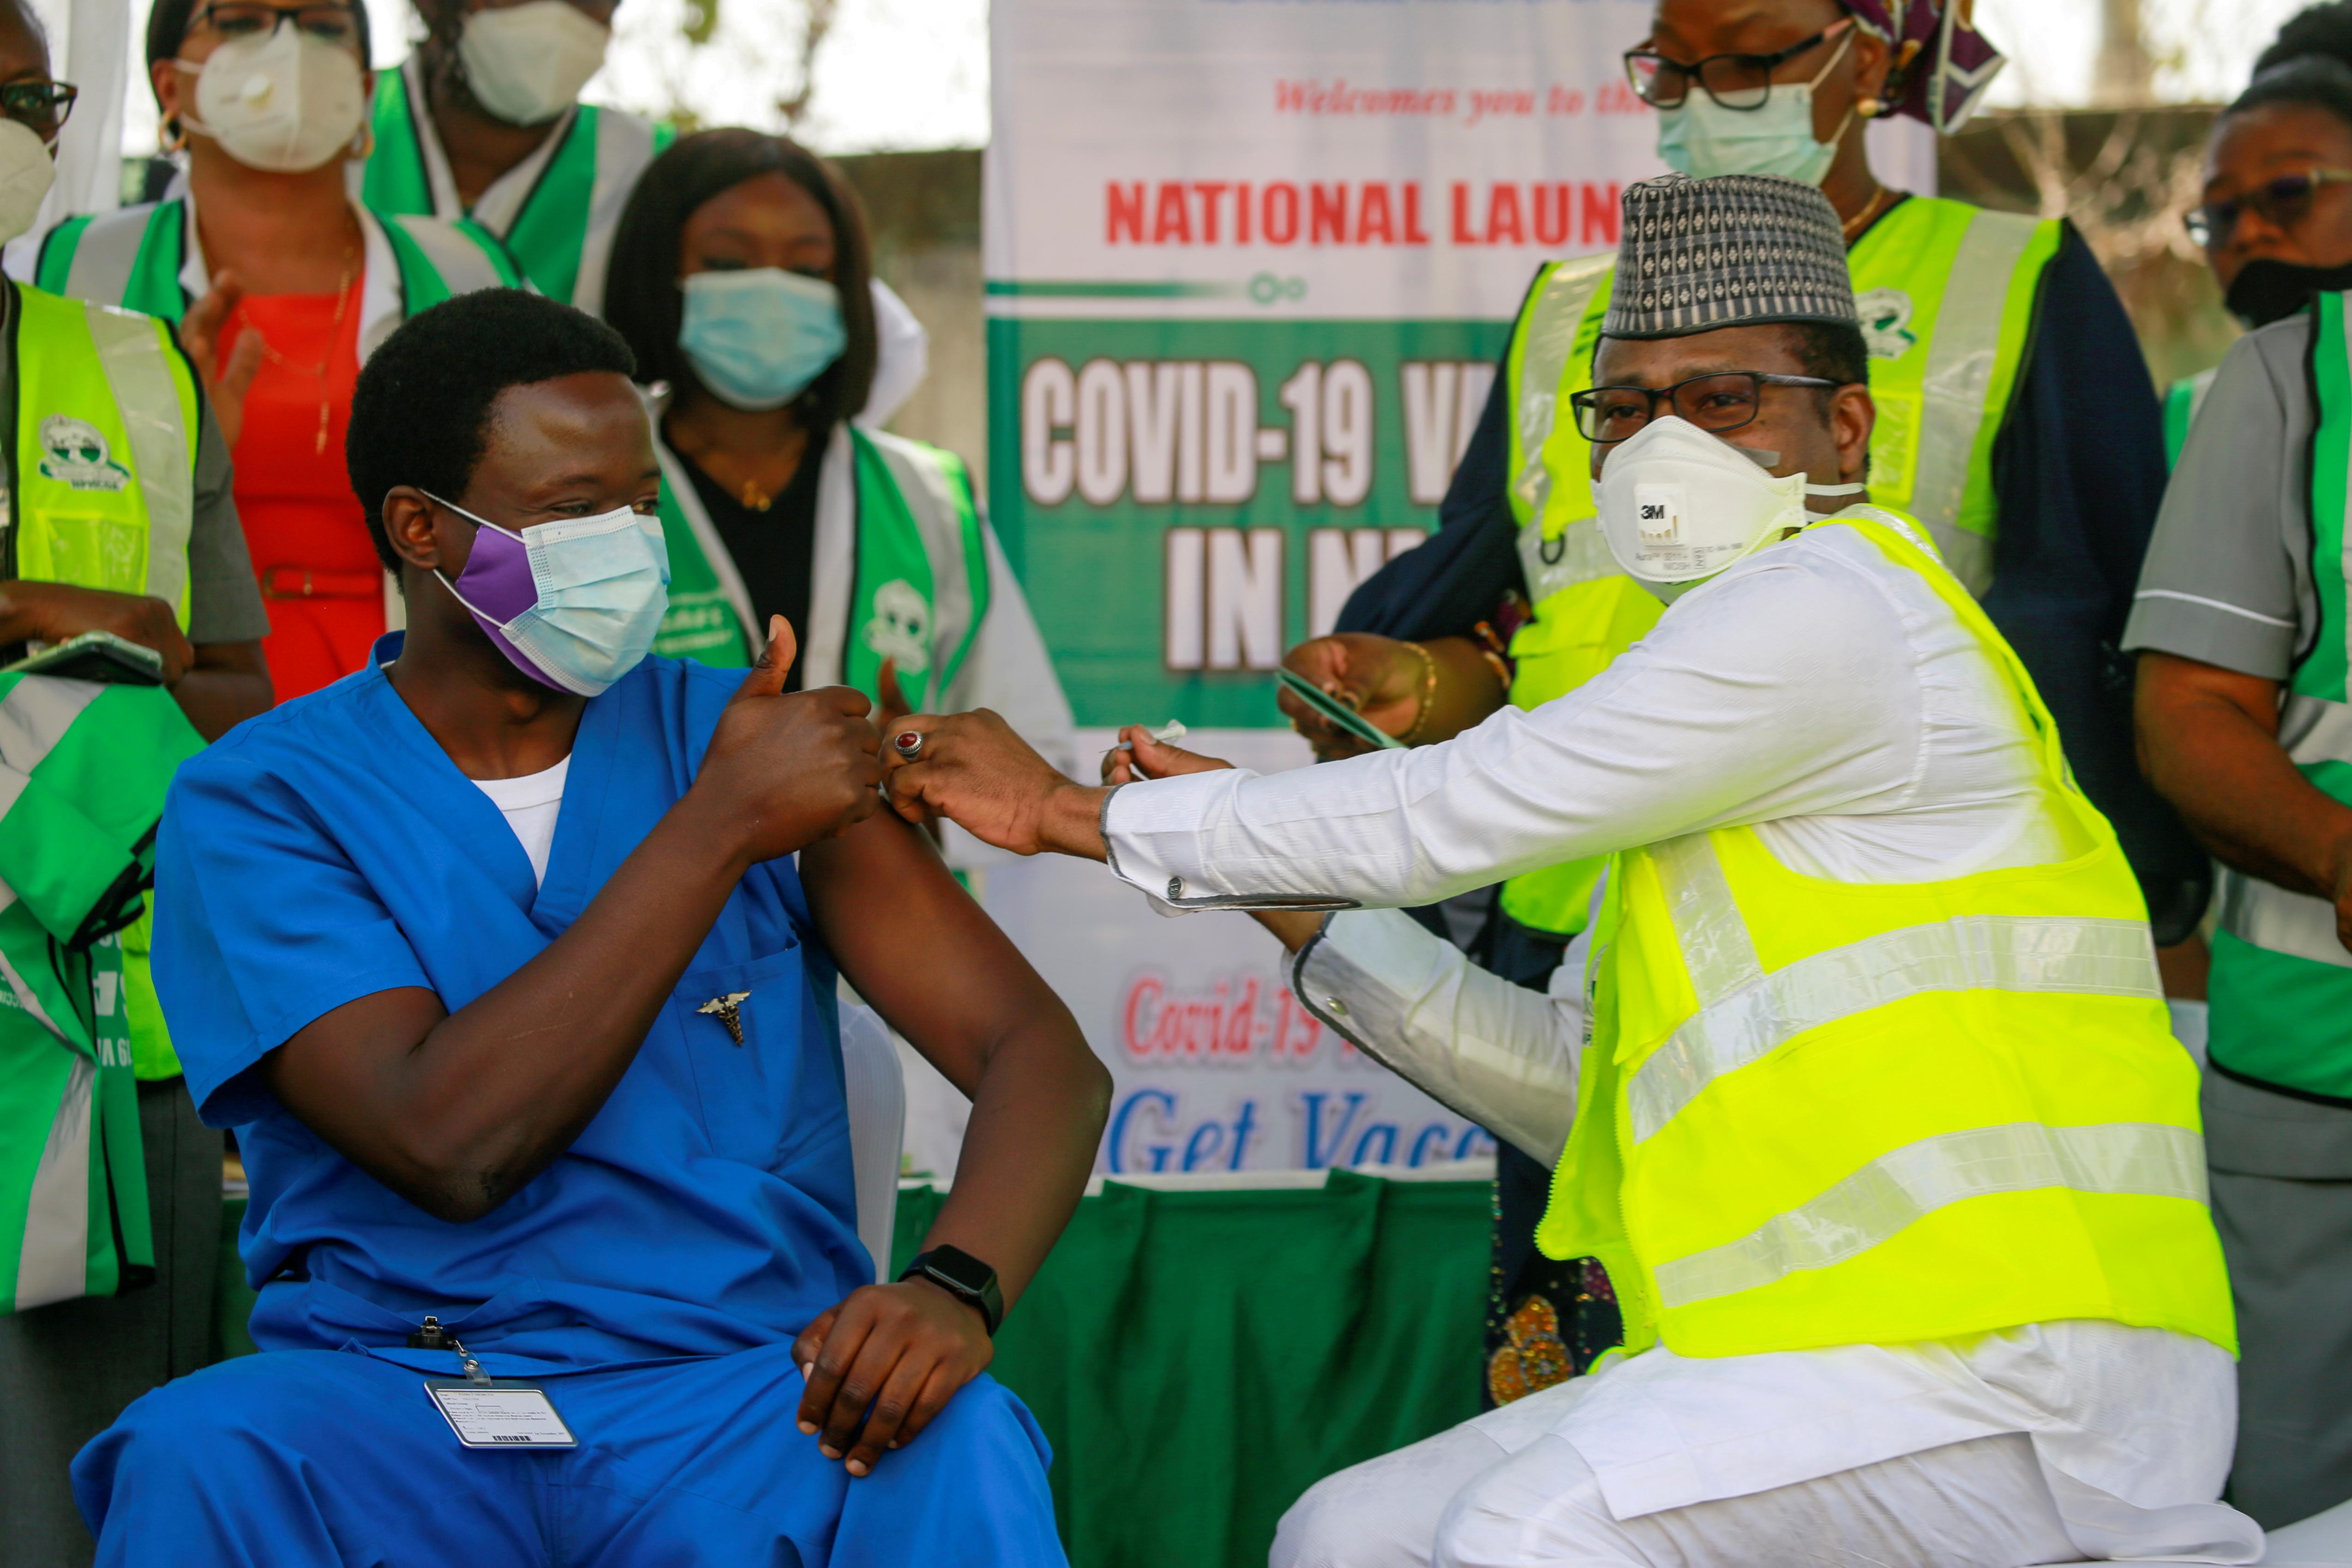 National hospital in Abuja, Nigeria